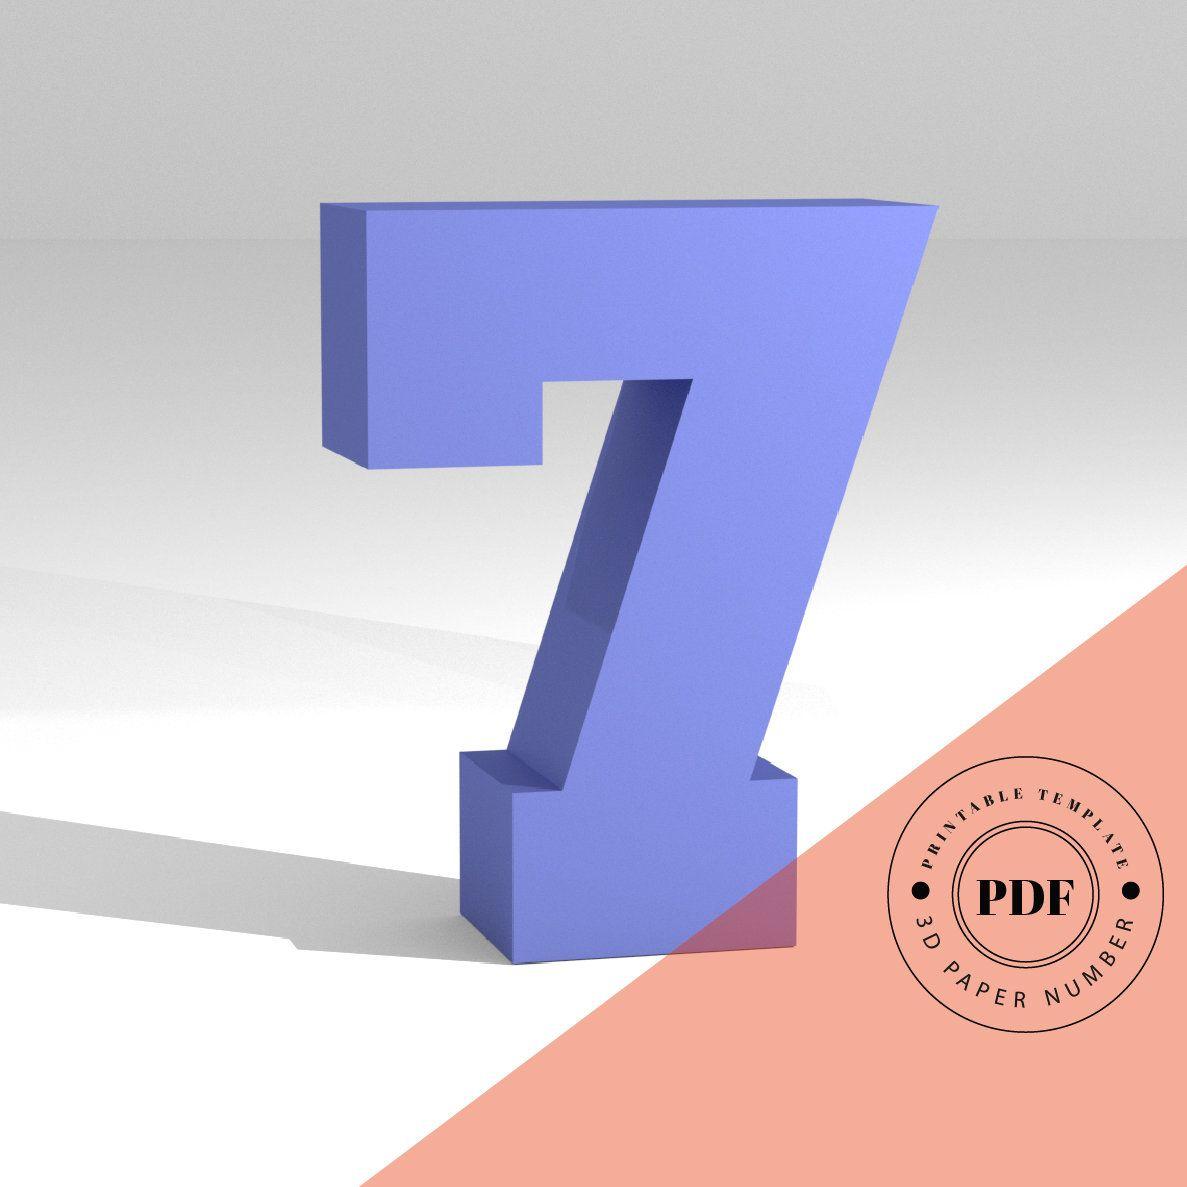 Printable Diy Template Pdf Number 7 Low Poly Paper Model